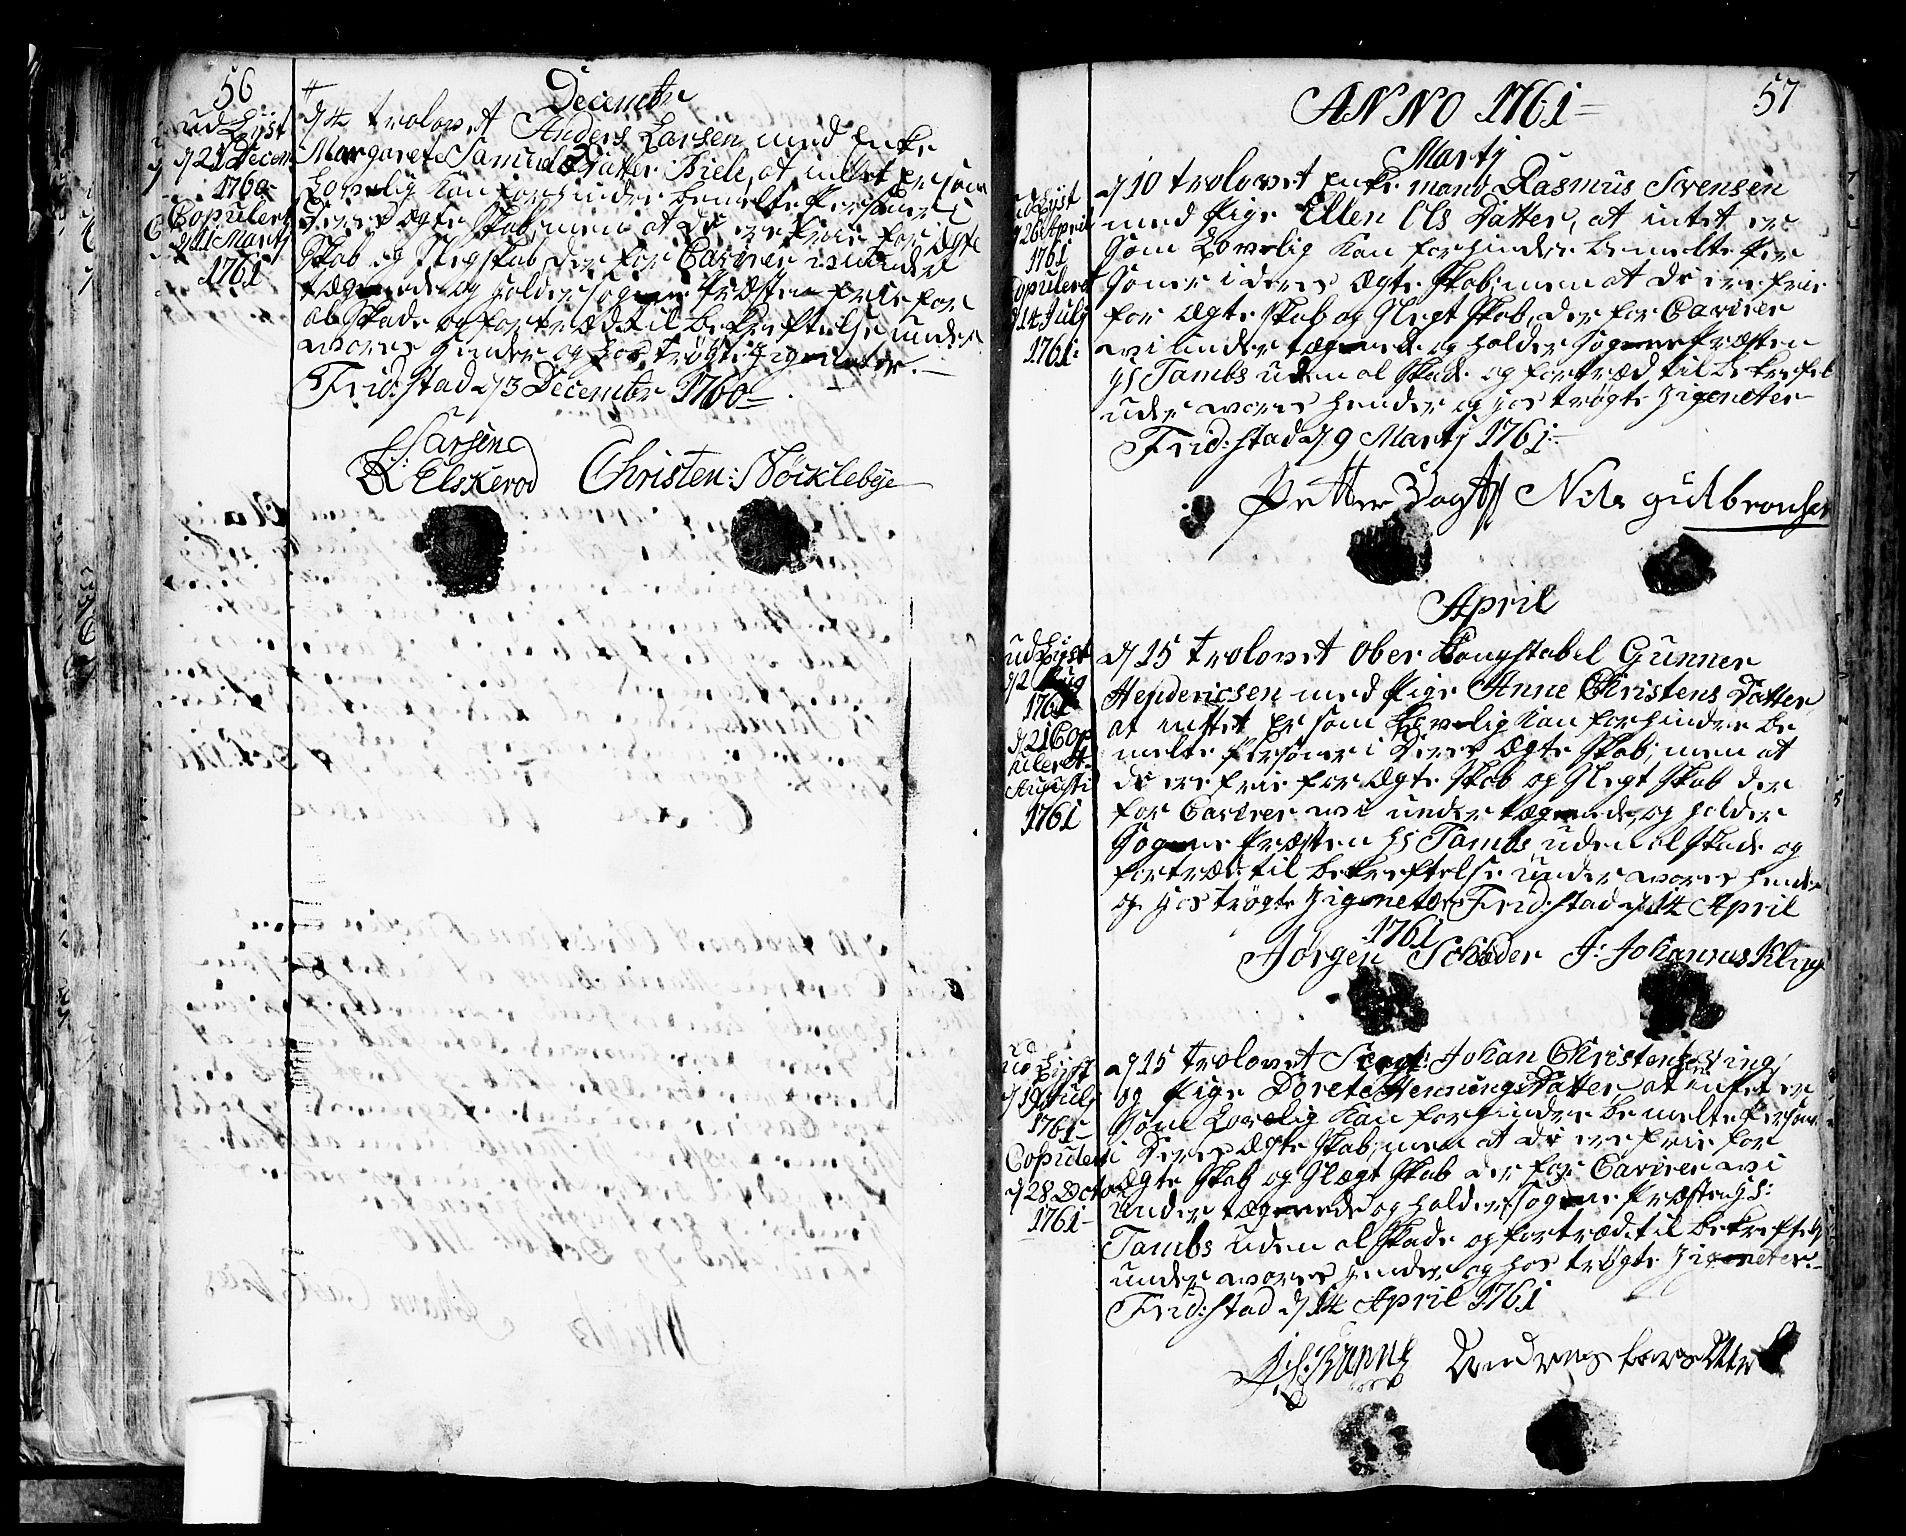 SAO, Fredrikstad prestekontor Kirkebøker, F/Fa/L0002: Ministerialbok nr. 2, 1750-1804, s. 56-57